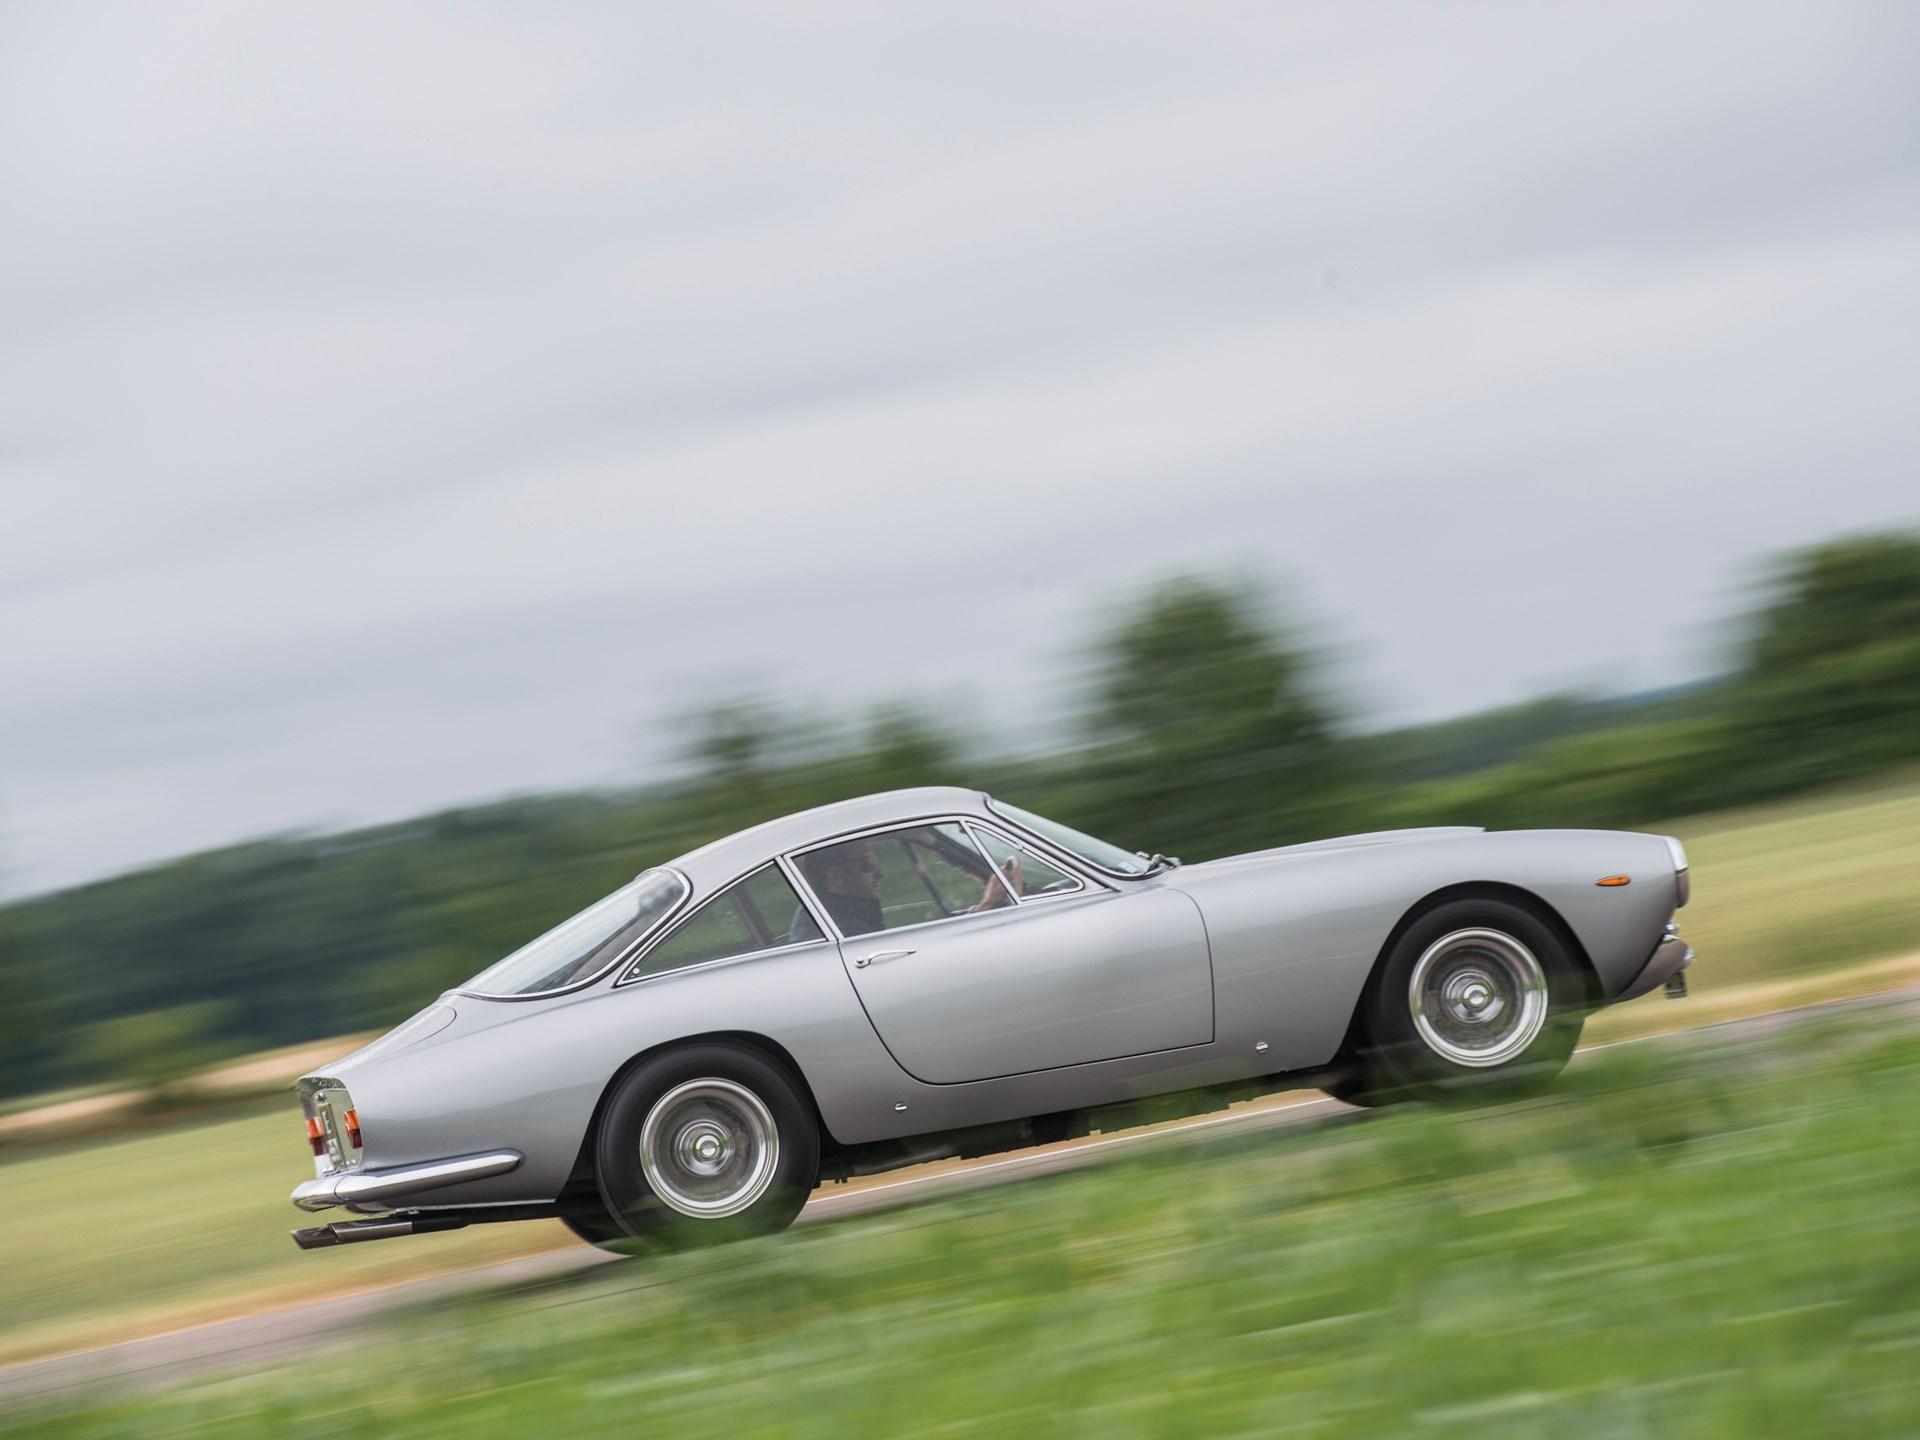 1964 Ferrari 250 GT/L Berlinetta 'Lusso' by Scaglietti